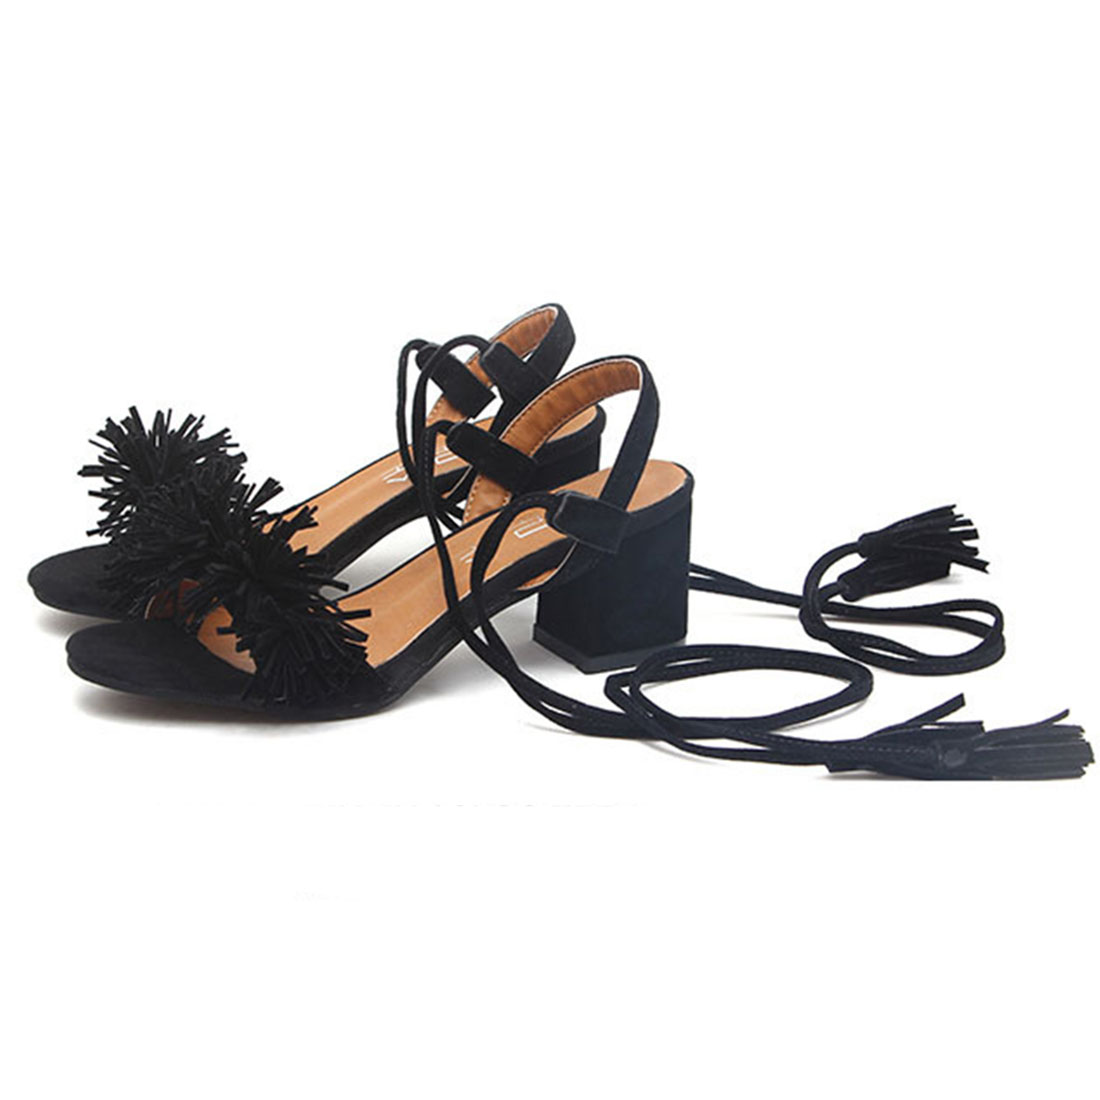 Black dress sandals medium heel - Women Sandal Ladies Fringe Shoes Plus Size 35 41 2017 New Hot Summer Mid High